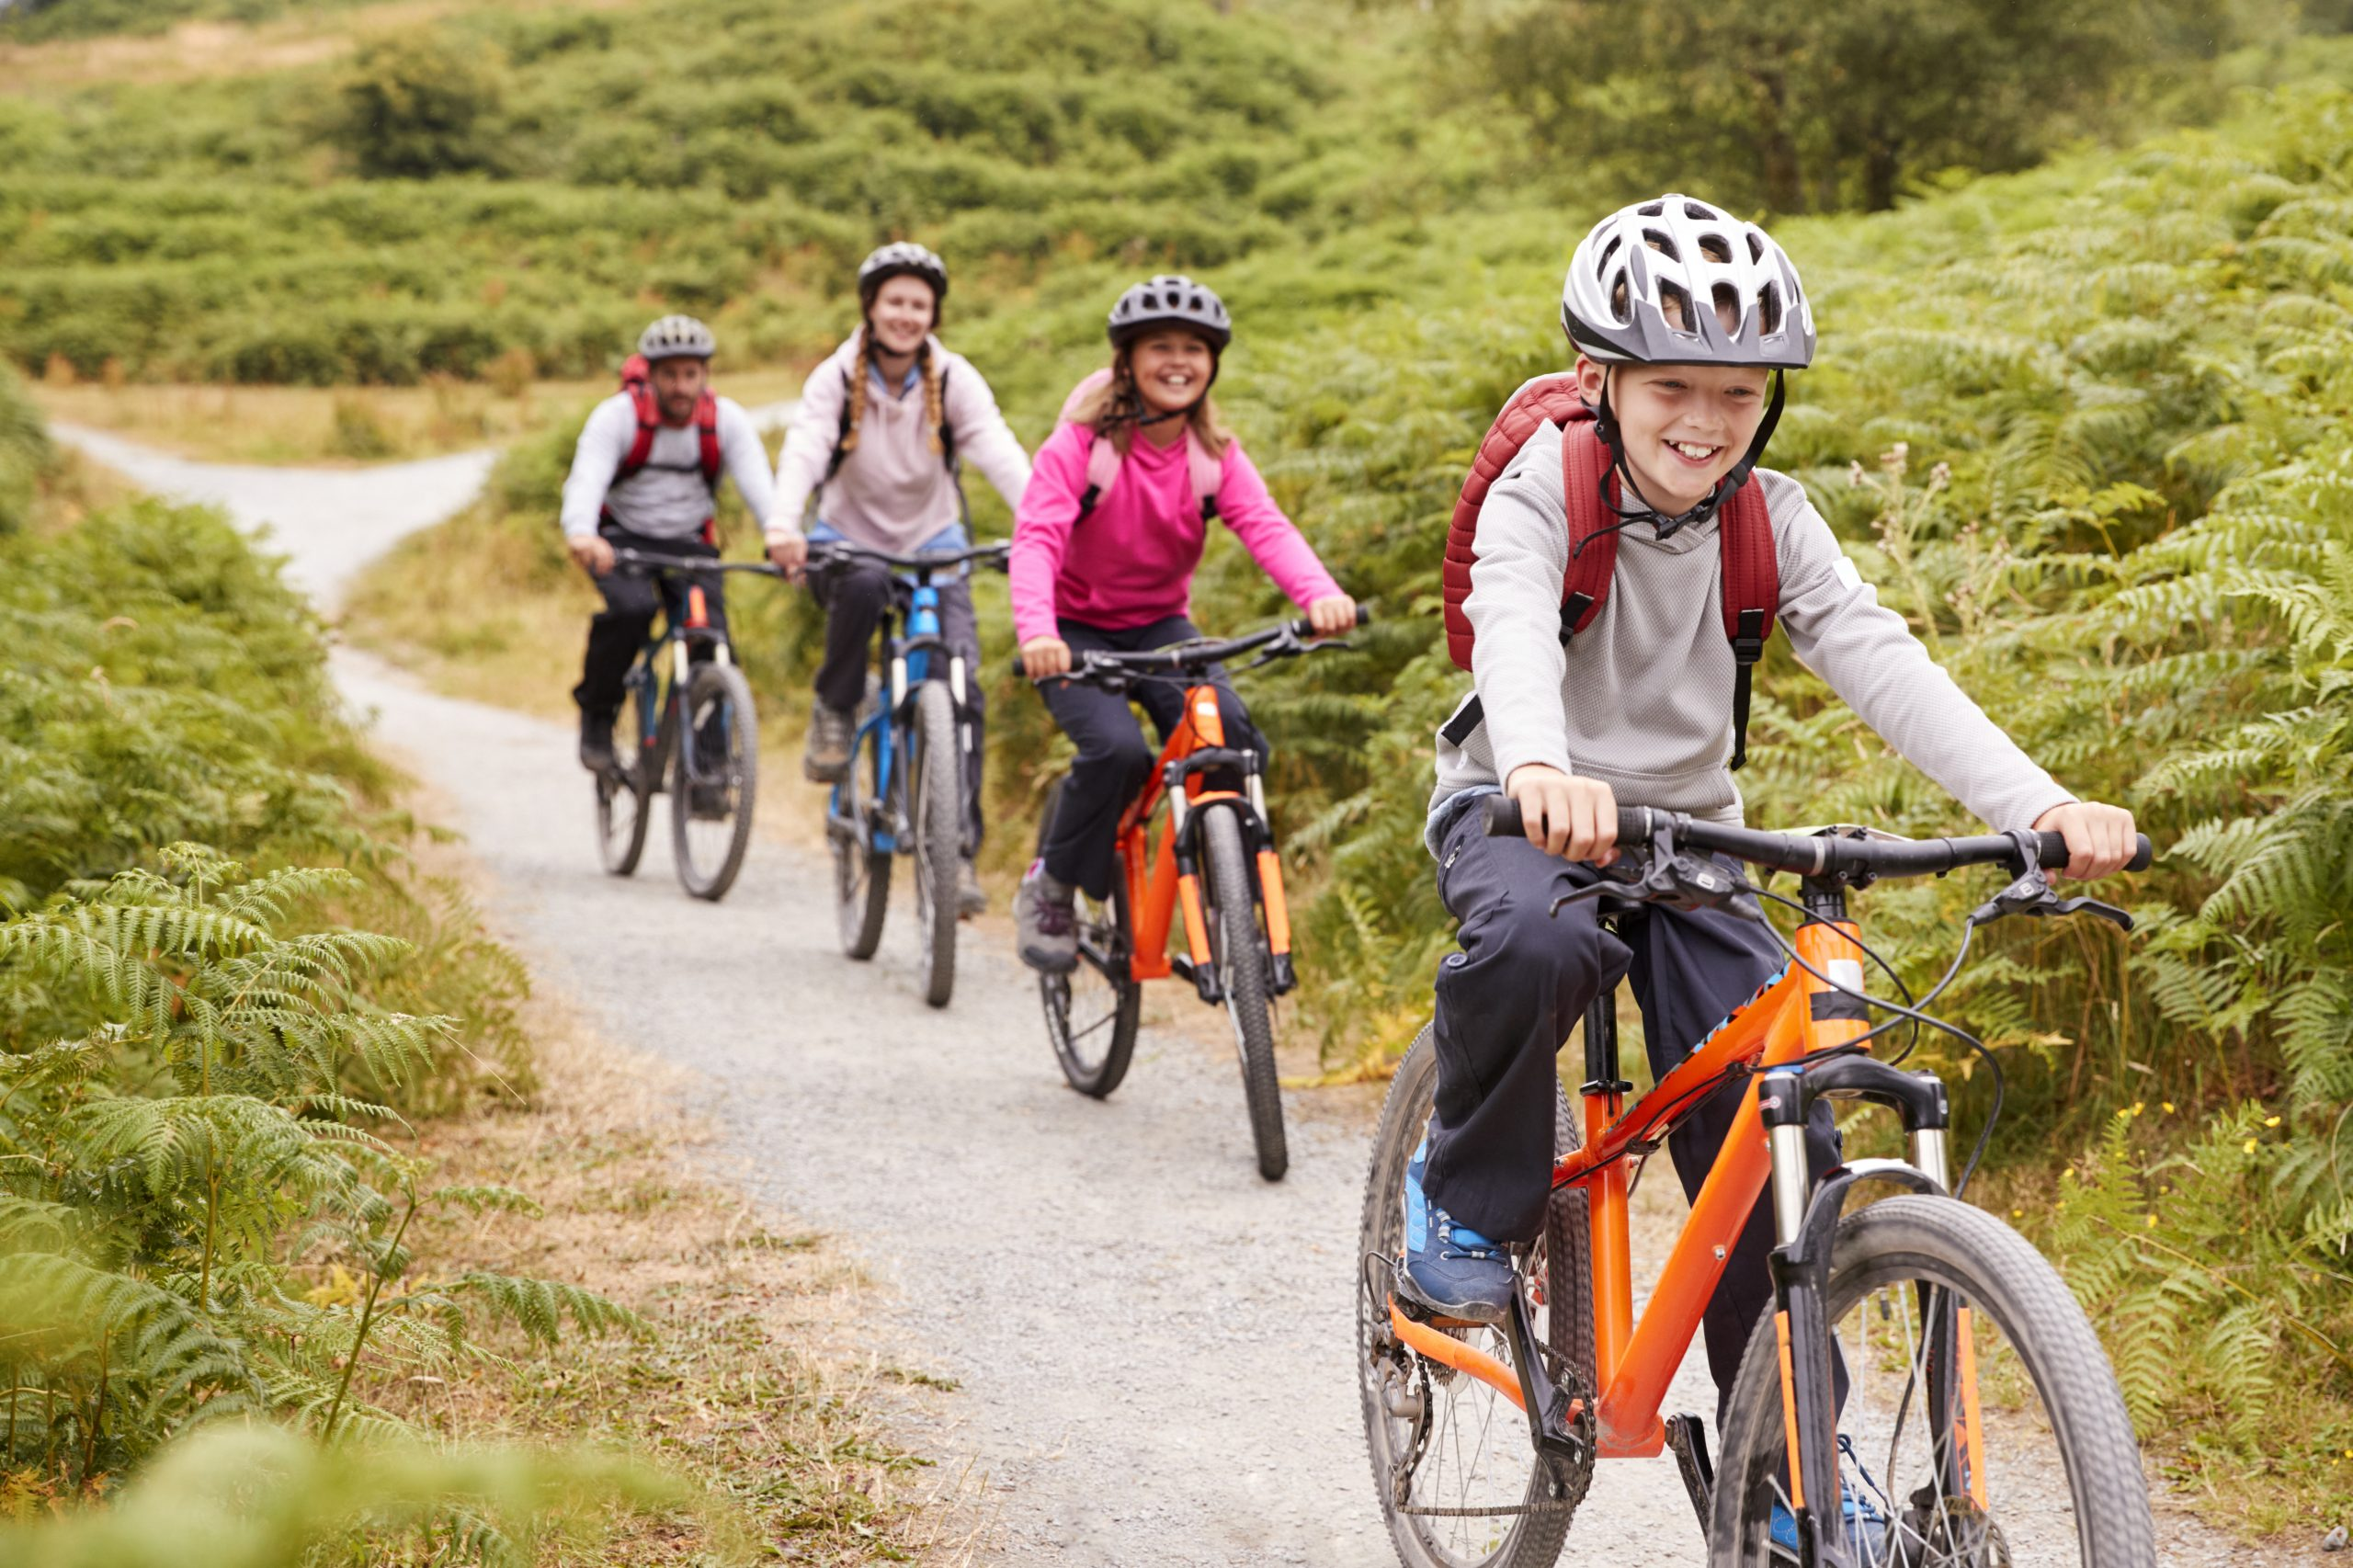 Family Bike Ride Adventure